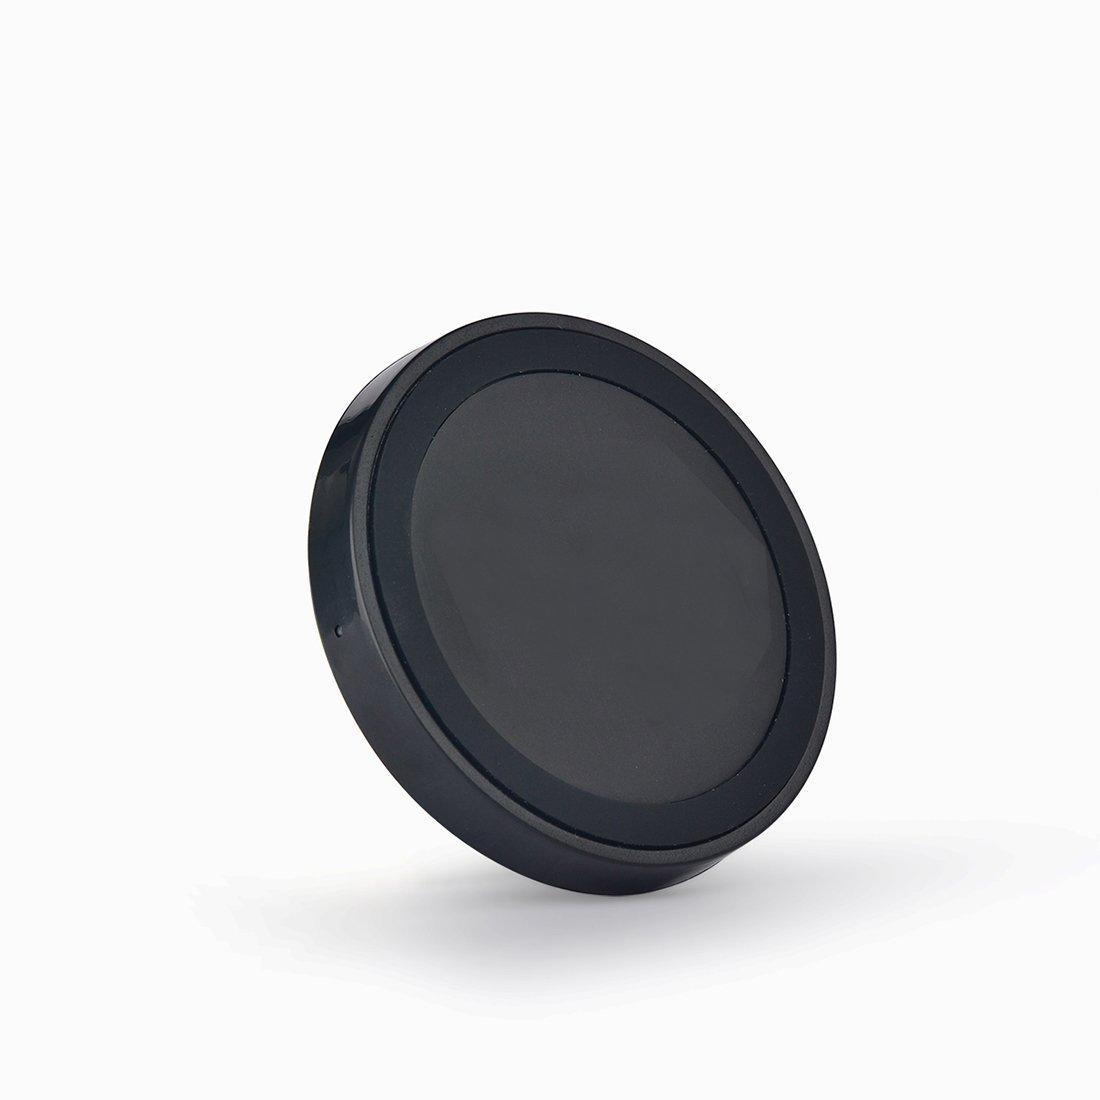 Универсальная беспроводная зарядка стандарта QI круглая zqi-t2002.jpg